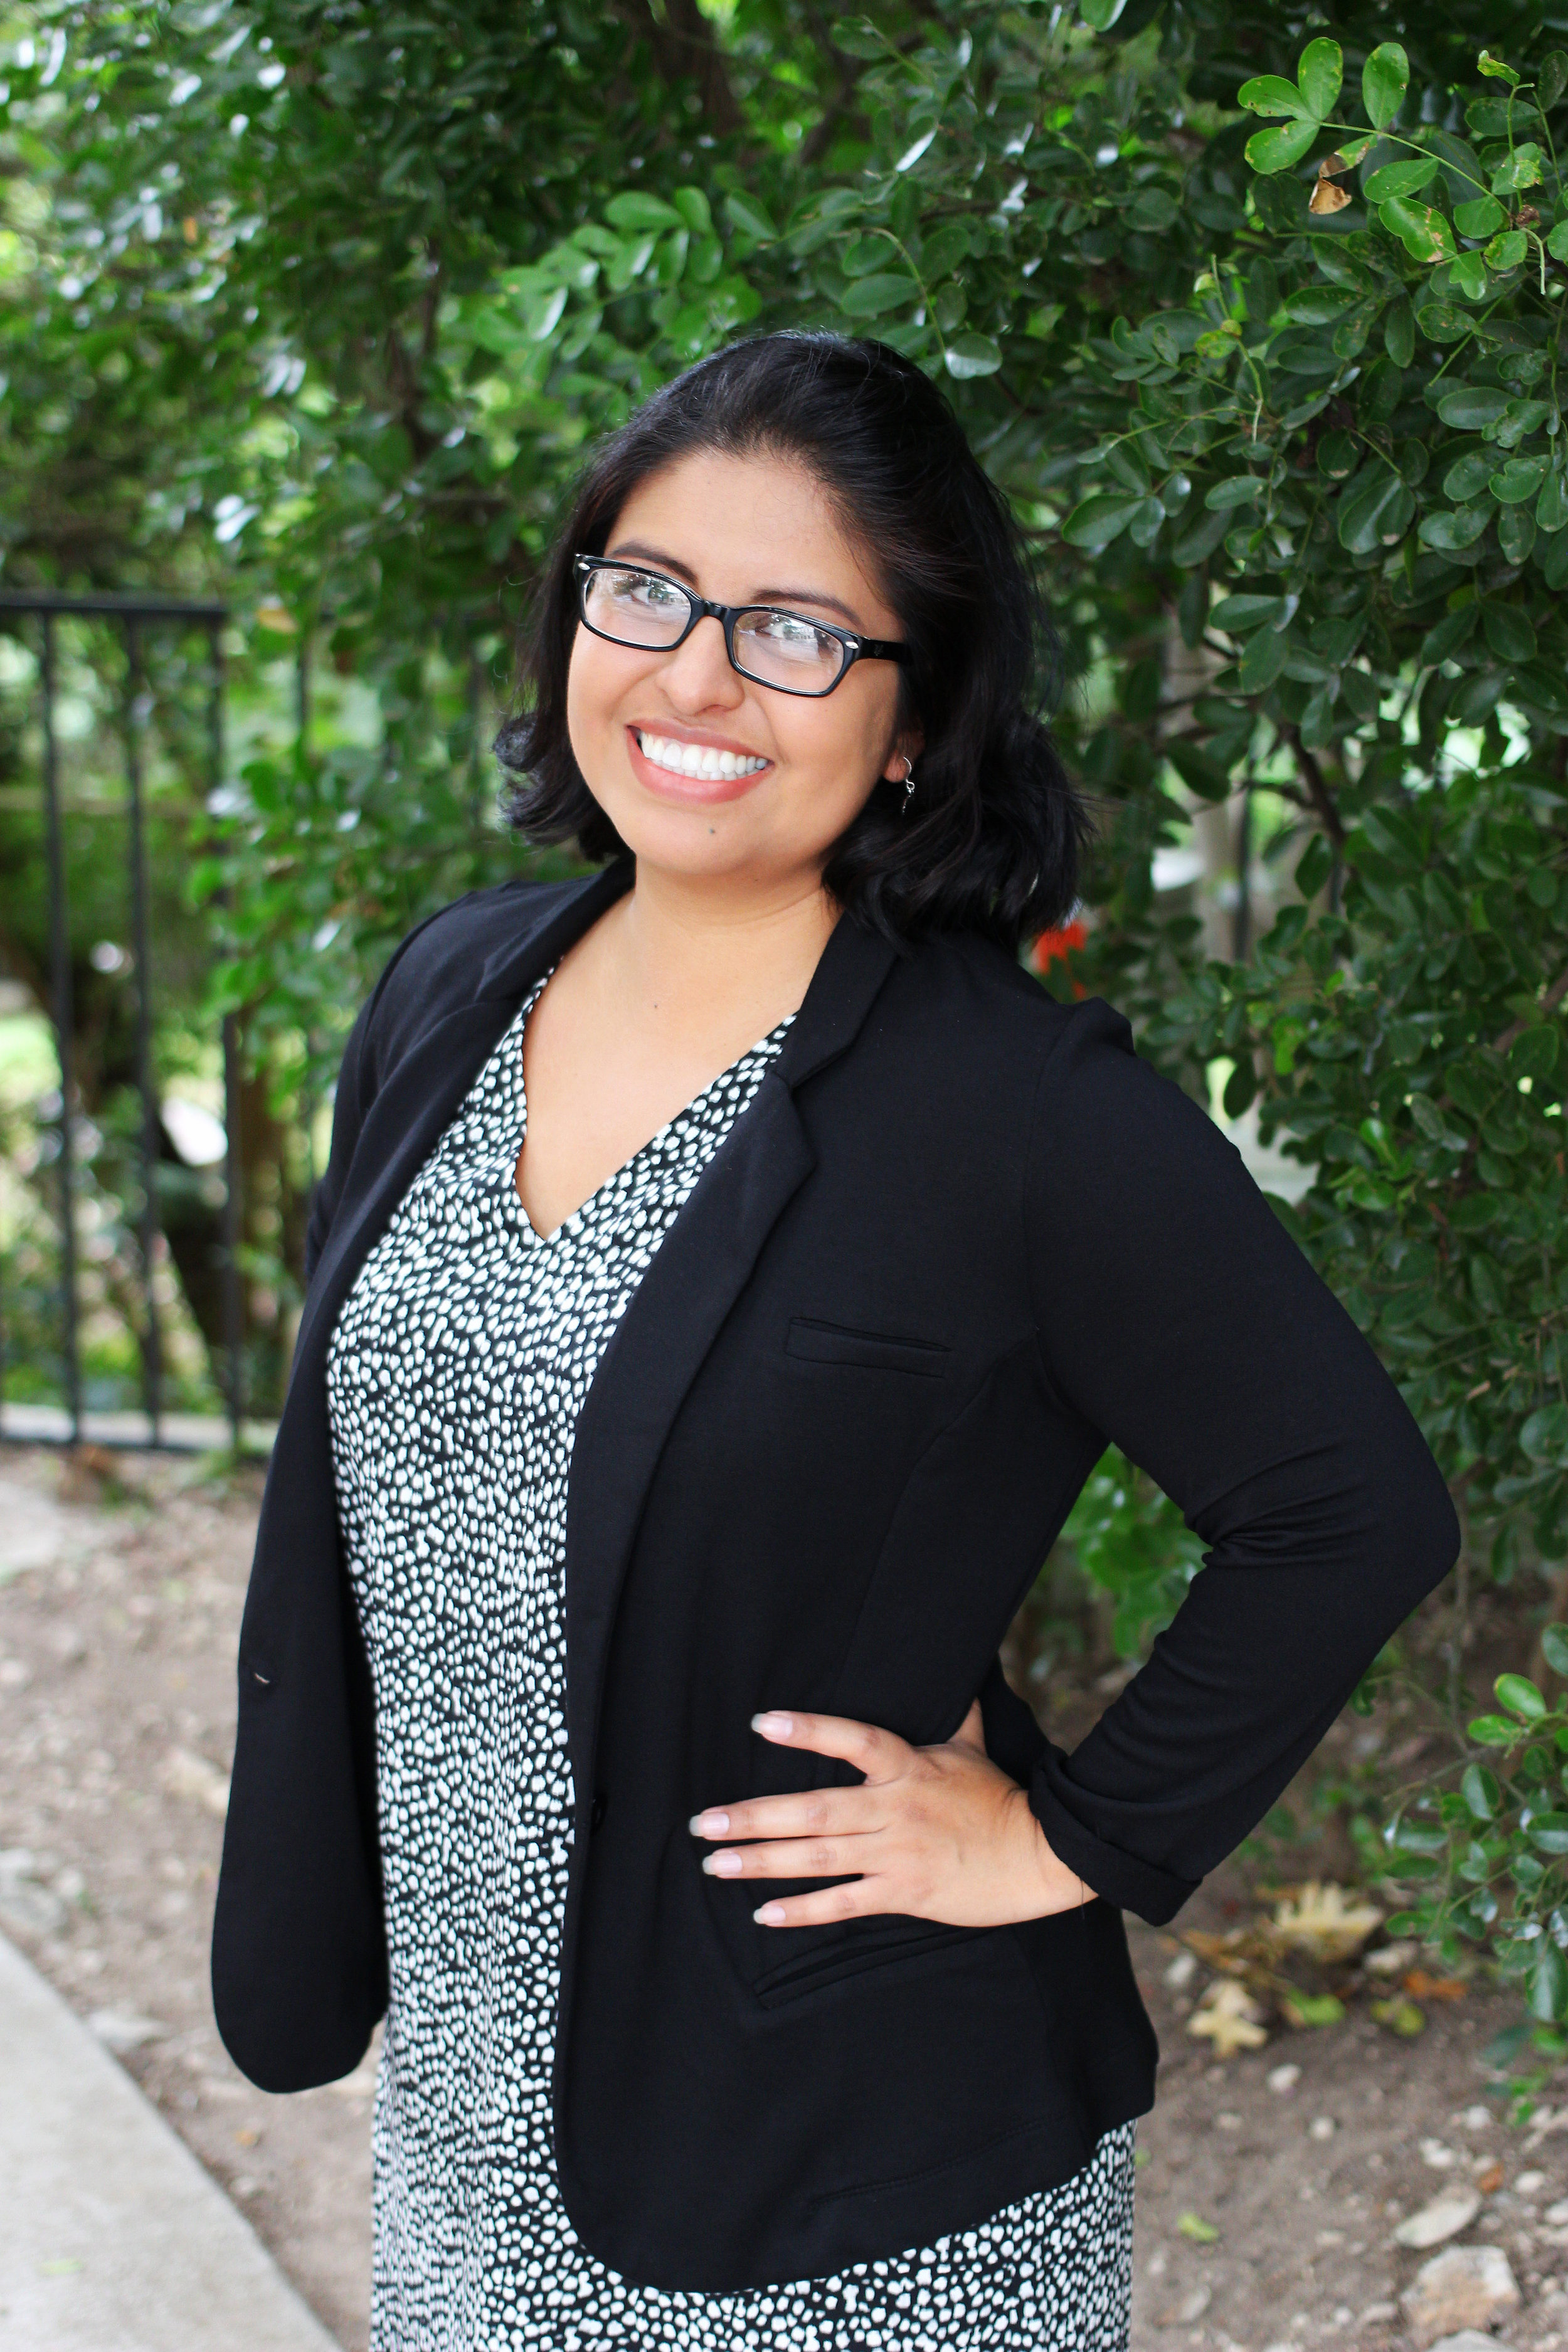 Paola Ortiz, MA, LMFT-Associate, Supervised by  Liz Gentry, MA, LMFT-S, LPC-S